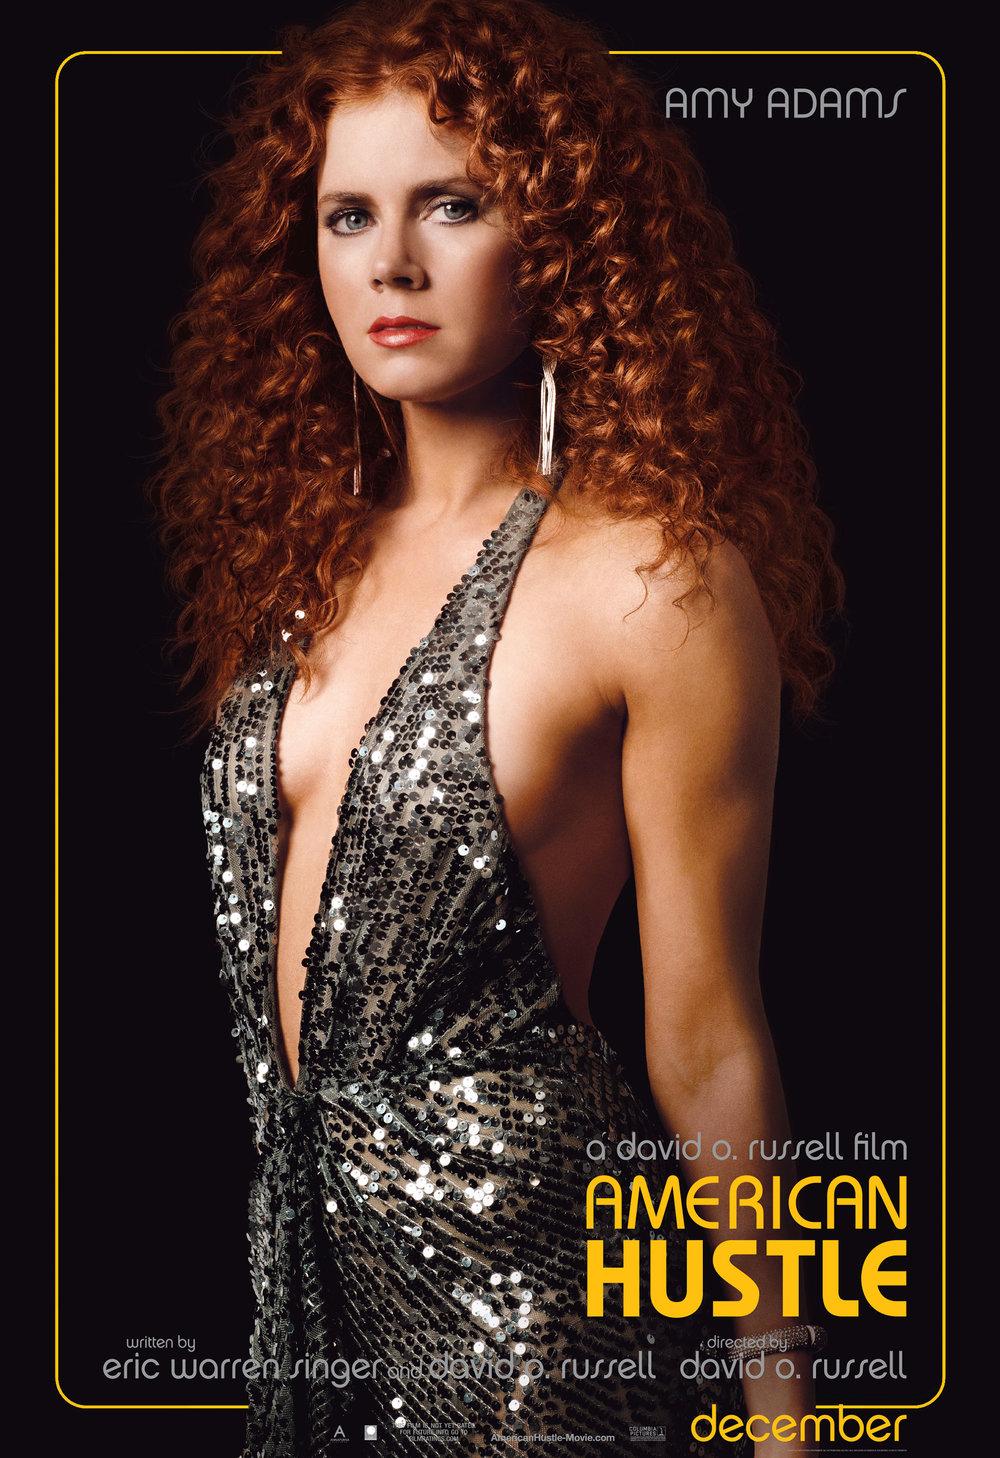 American Hustle, Amy Adams